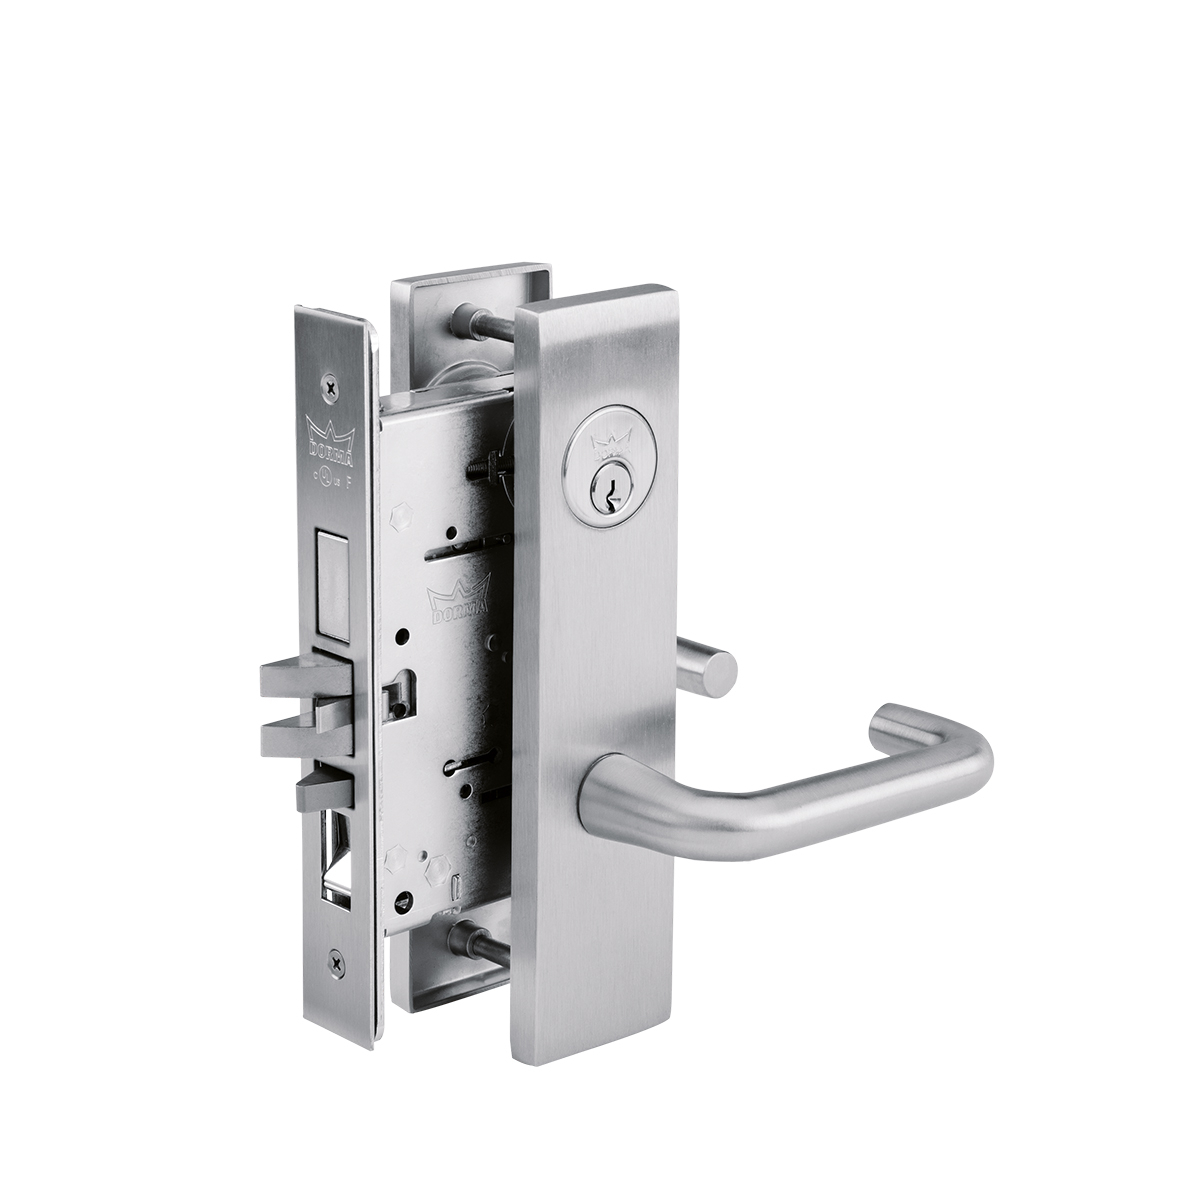 General Hardware & Locks